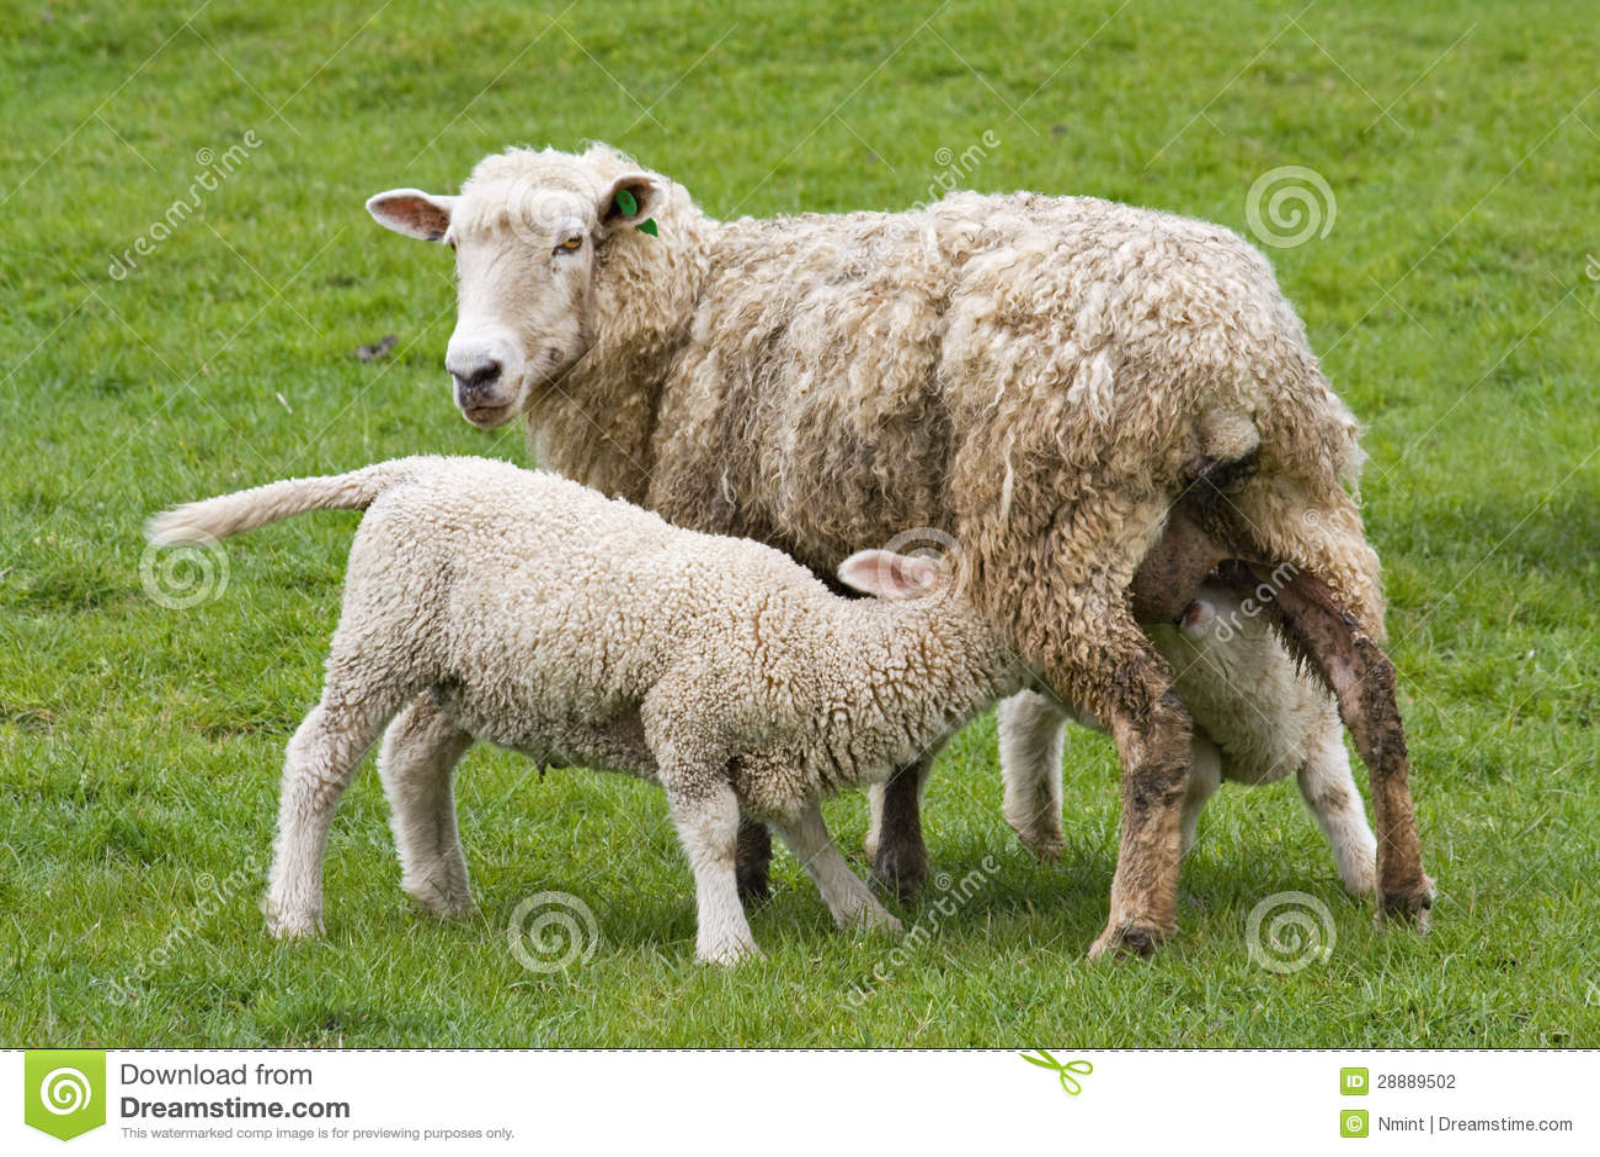 Goat Farming Business Plan For Beginners